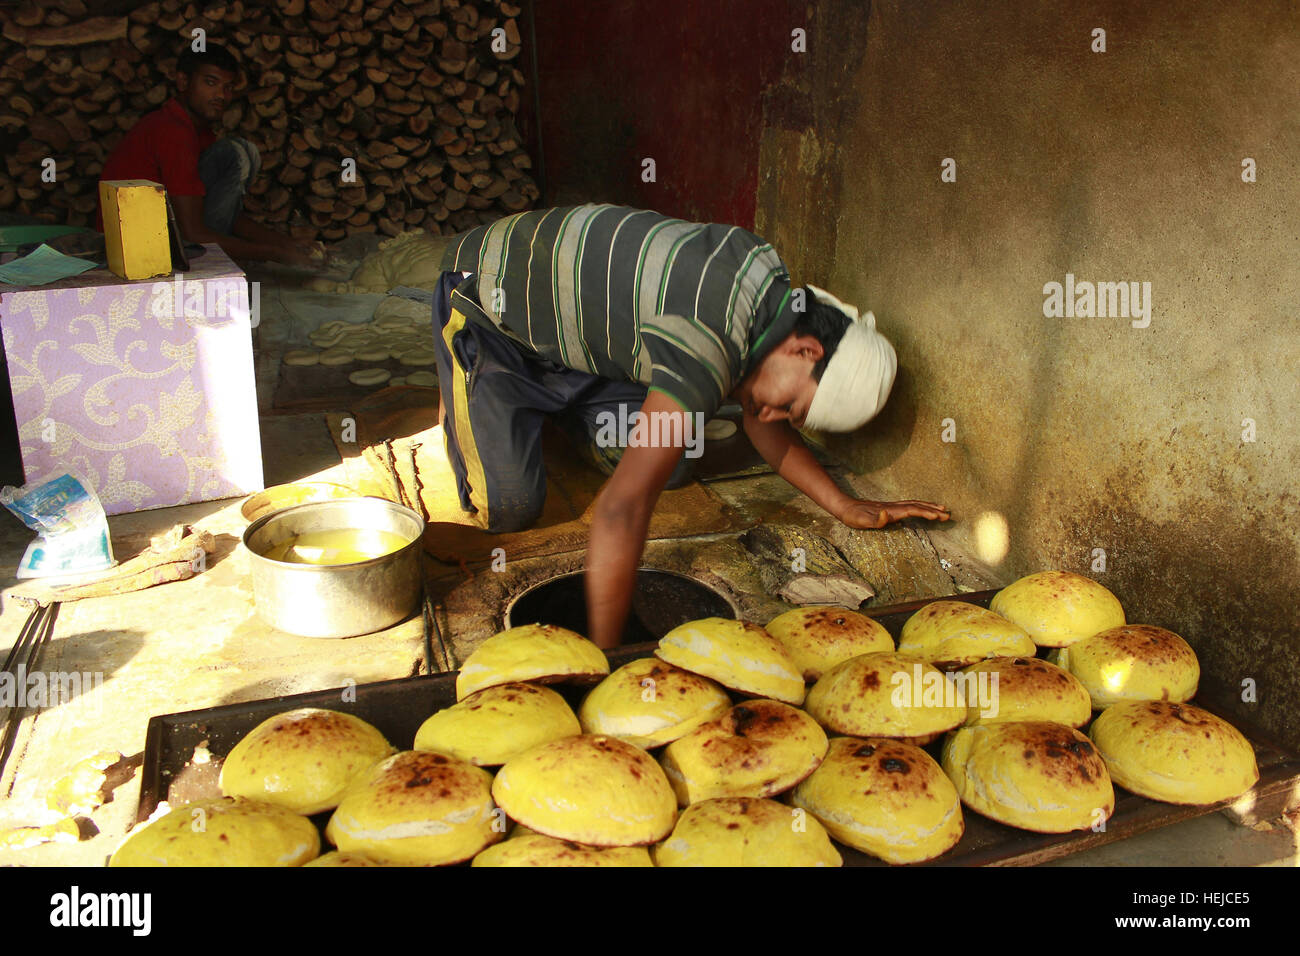 Making Naan in a restaurant, Aurangabad, India - Stock Image